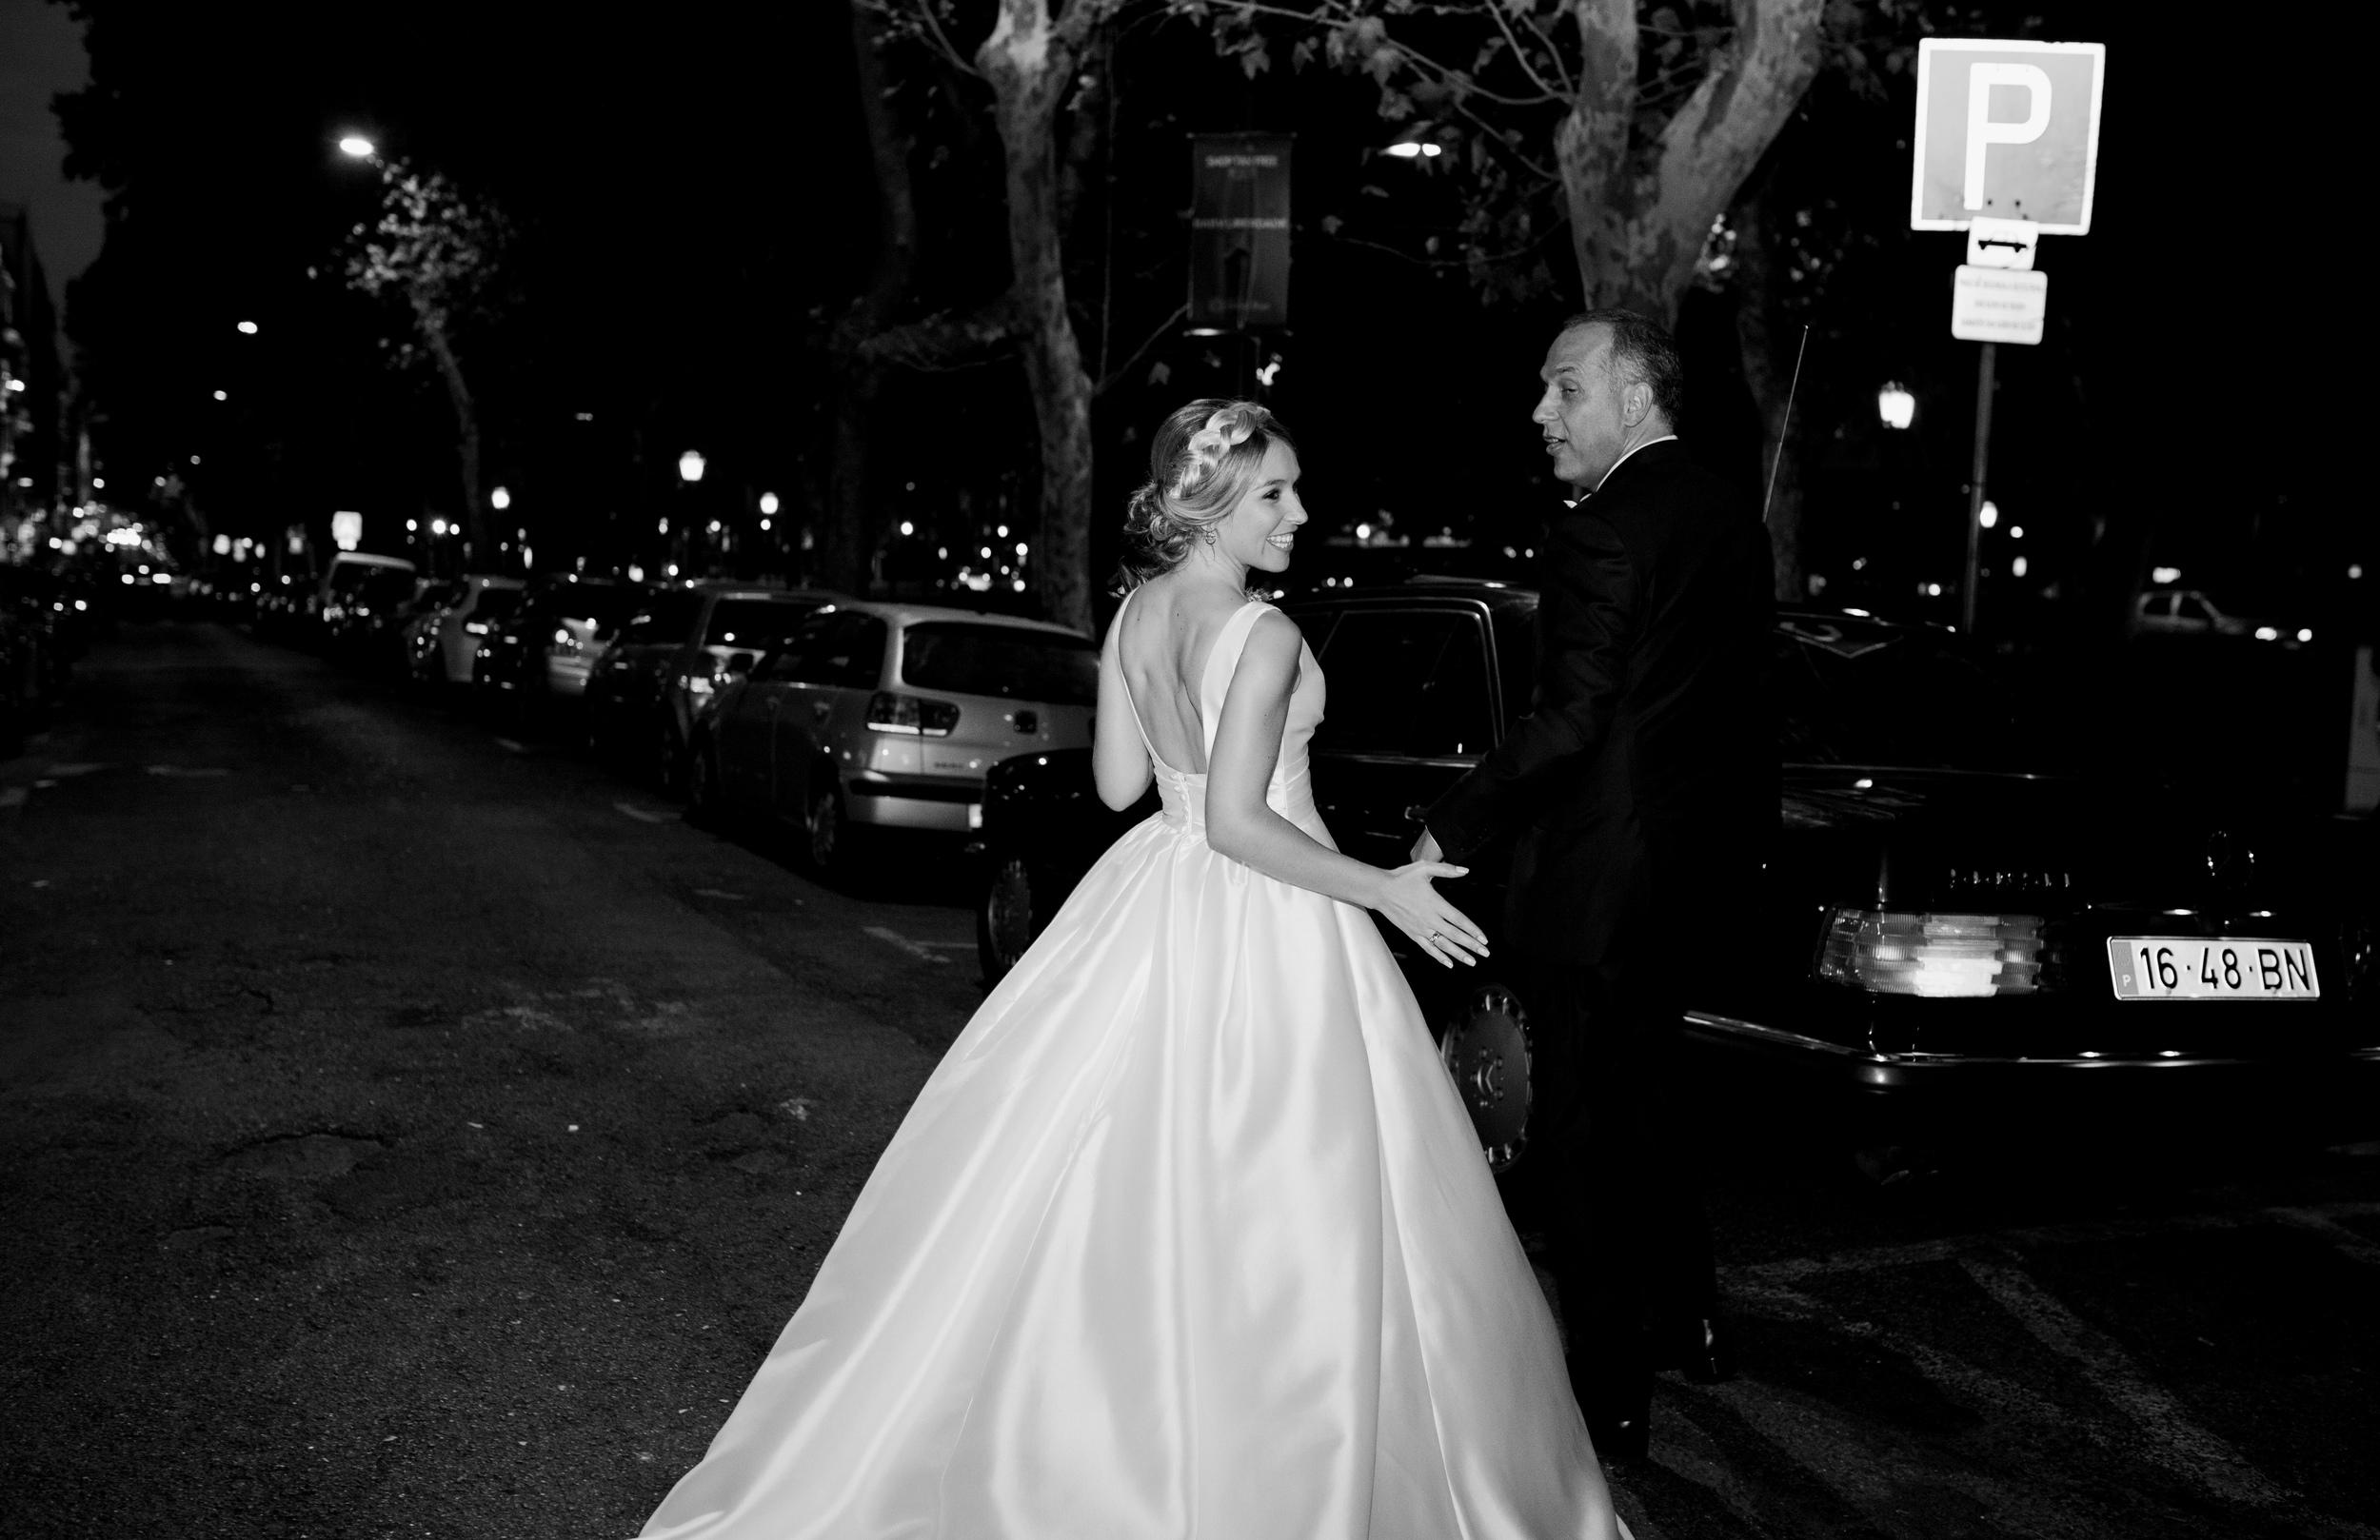 mariarao+wedding+estufa+fria-243.jpg